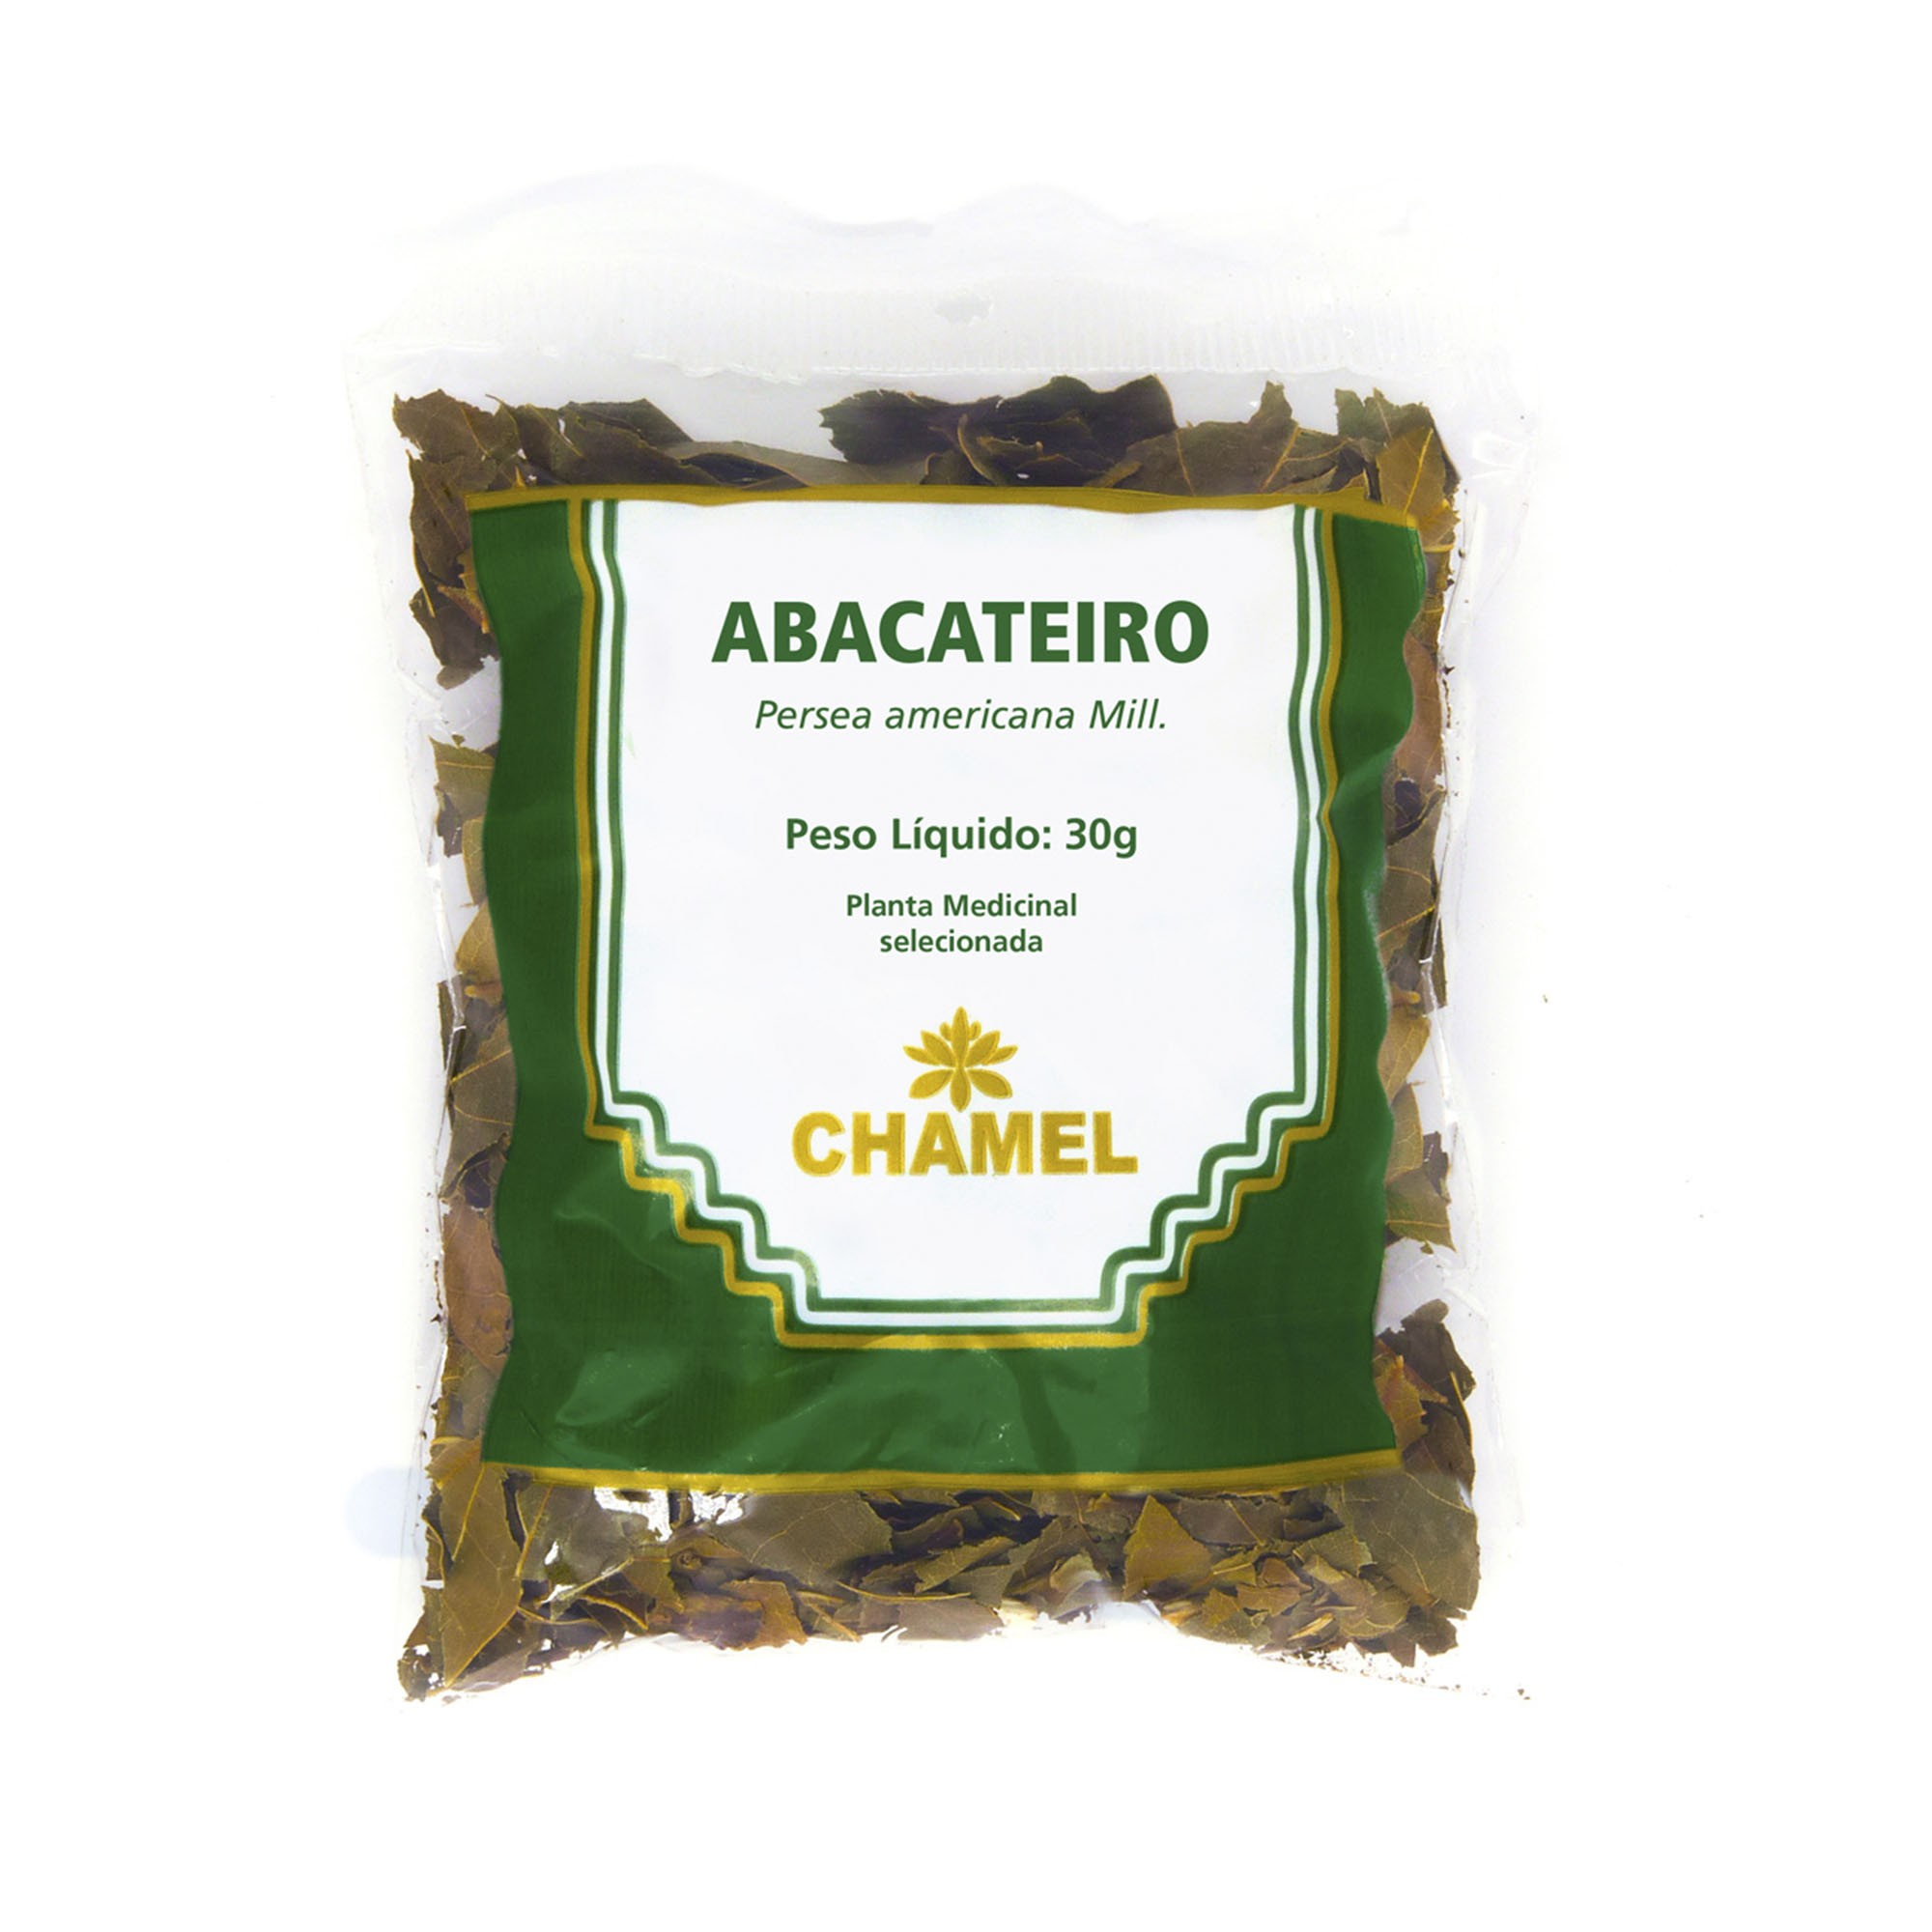 Abacateiro 30g Chamel - Chá-Folhas